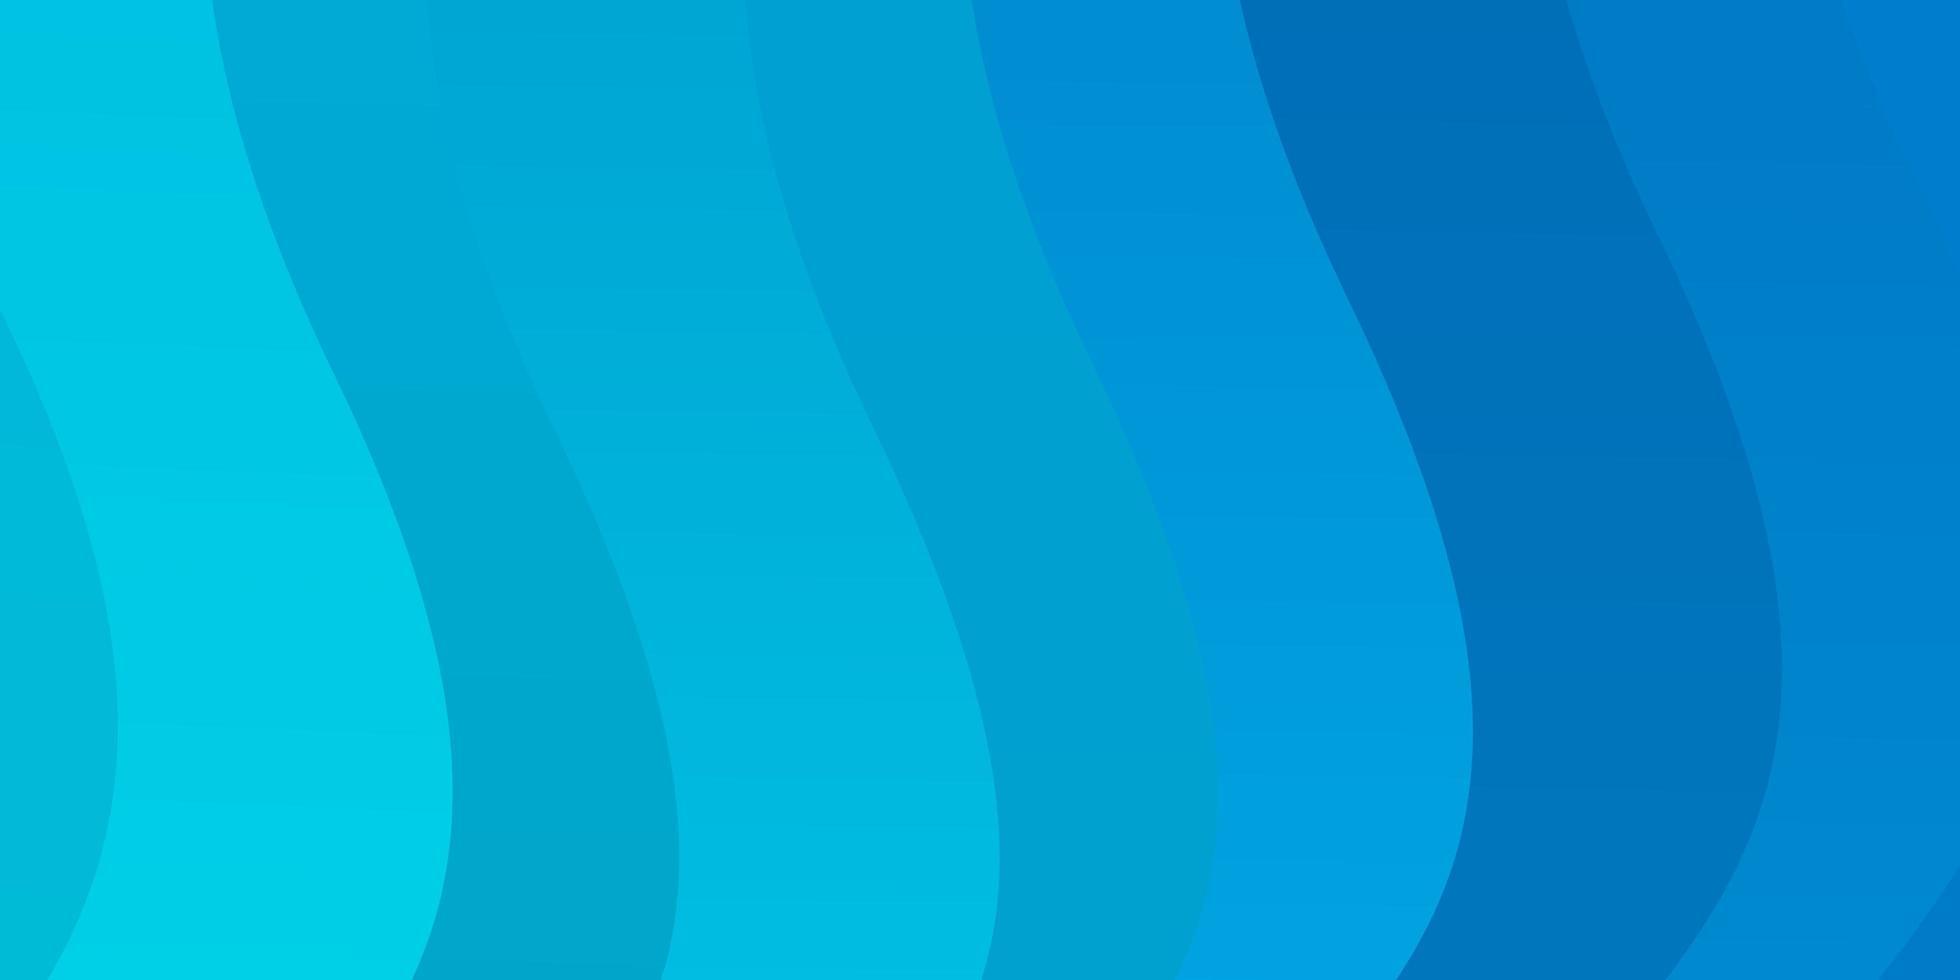 texture de vecteur bleu clair avec arc circulaire.